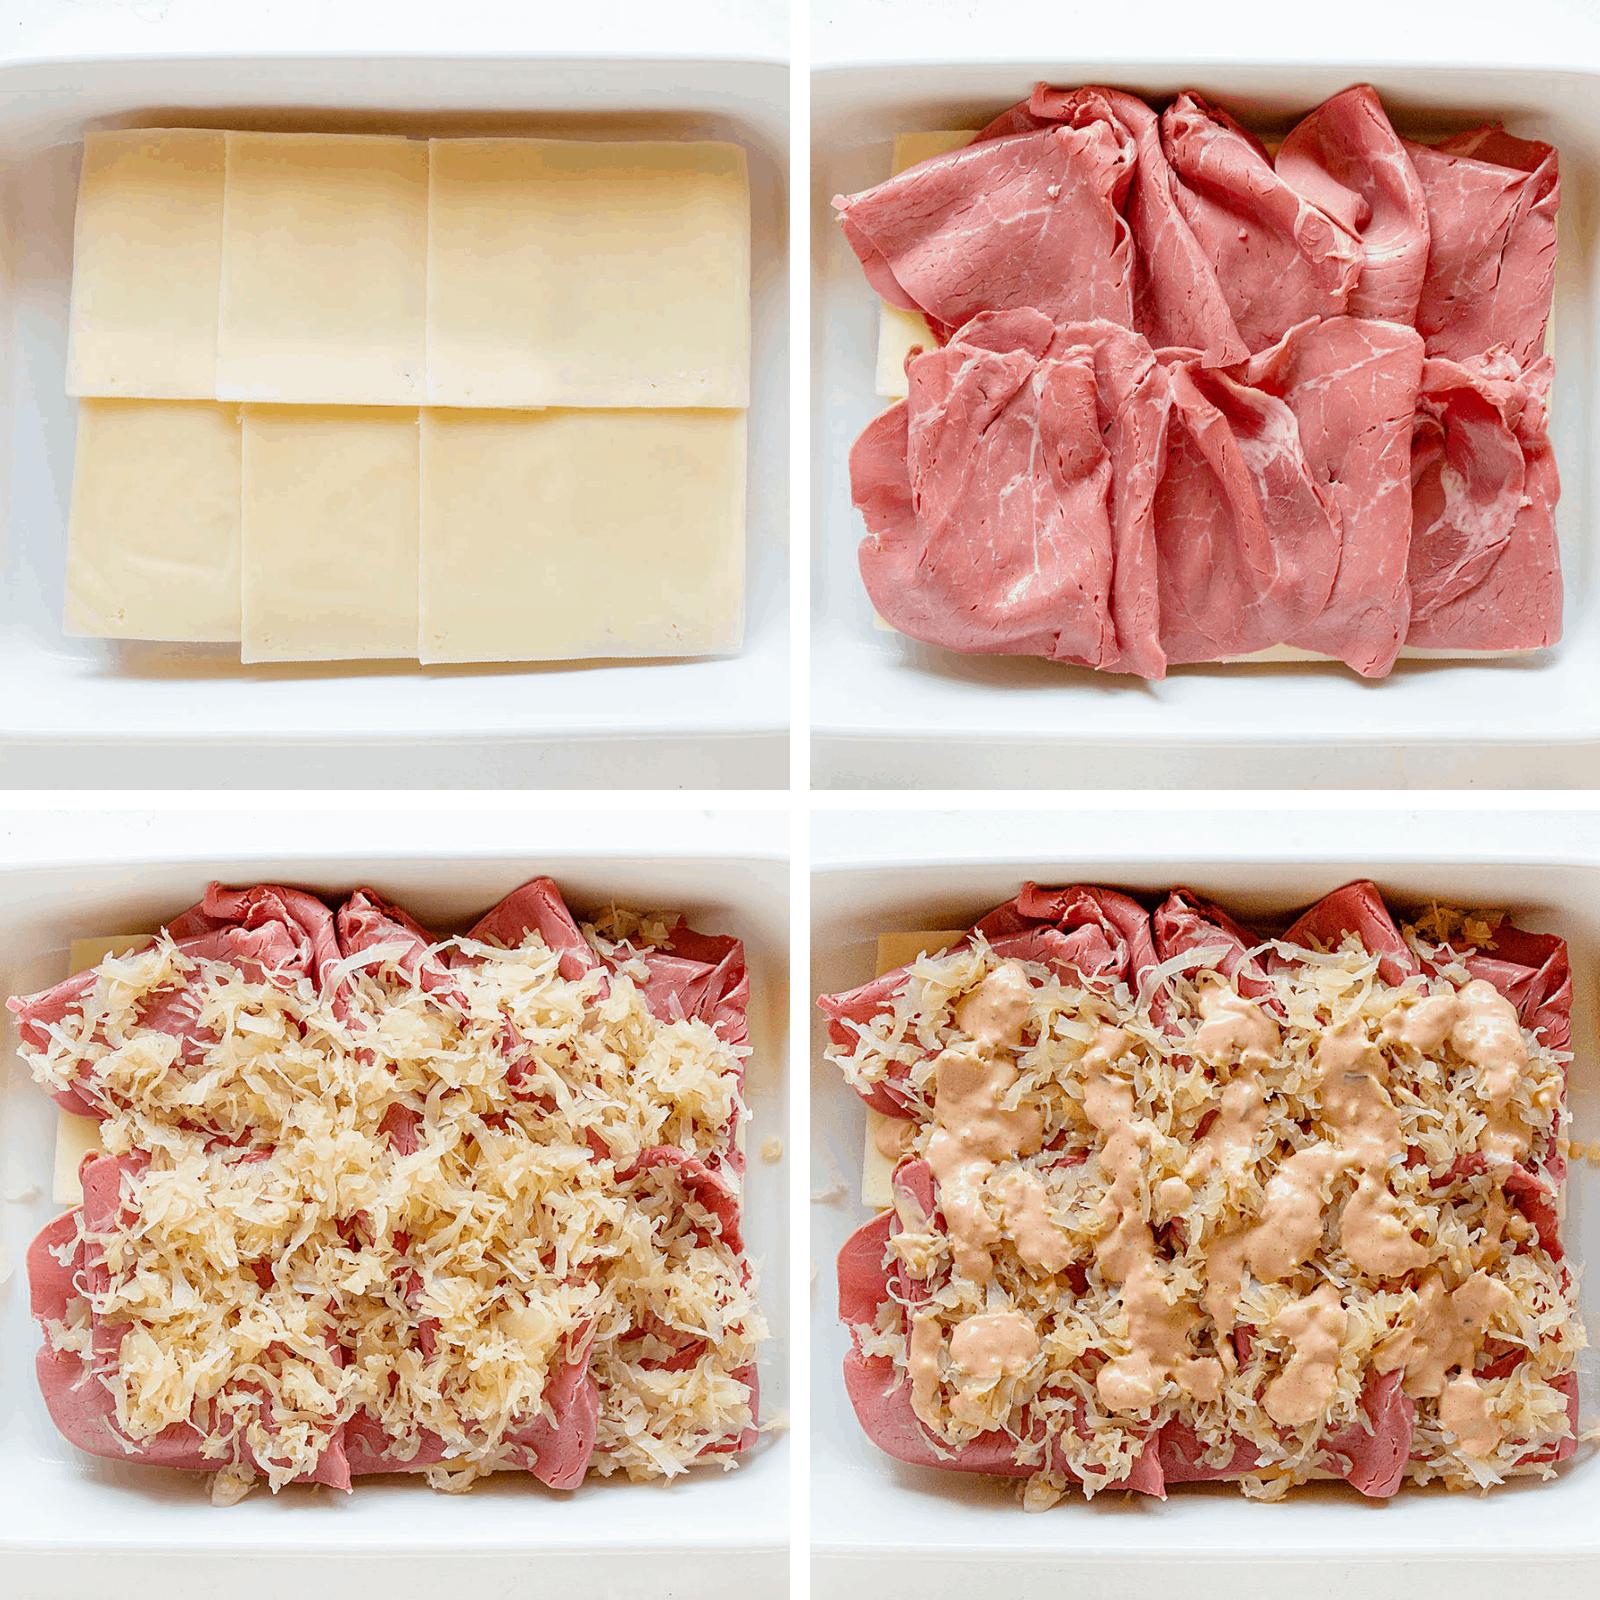 Reuben Slider Ingredients